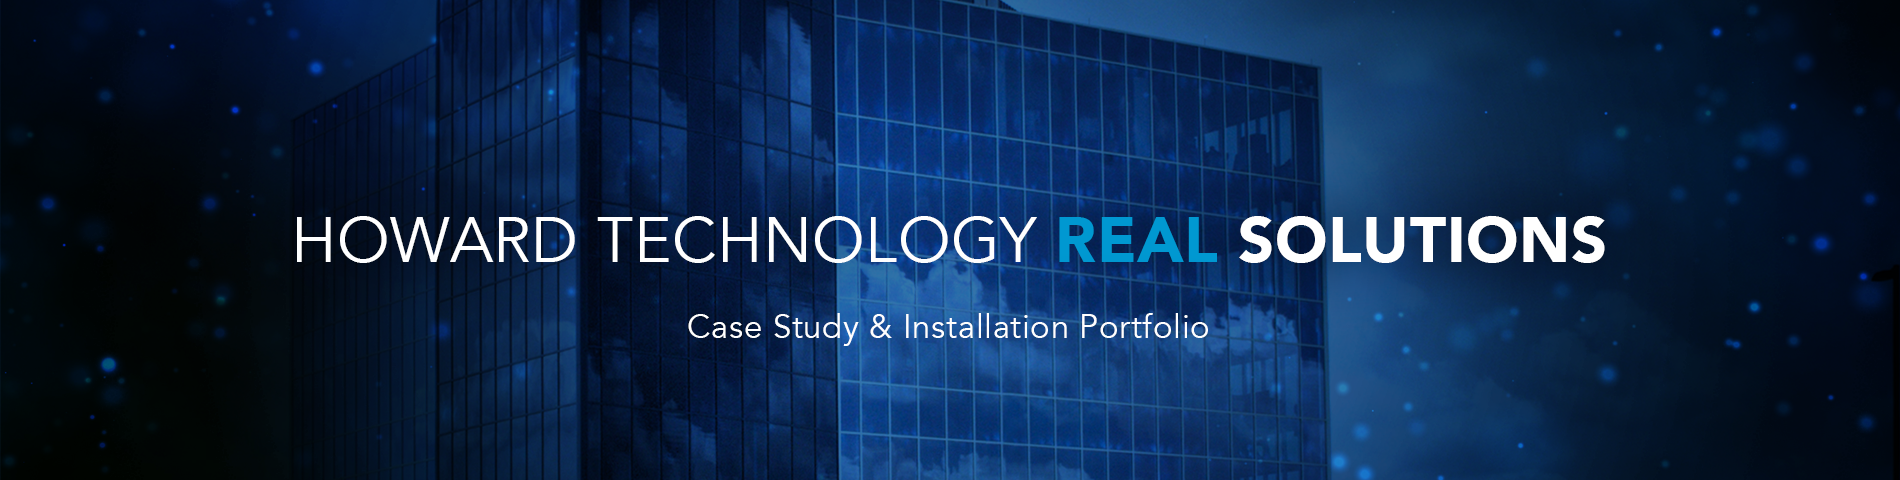 Howard Technology Solutions Case Study & Installation Portfolio